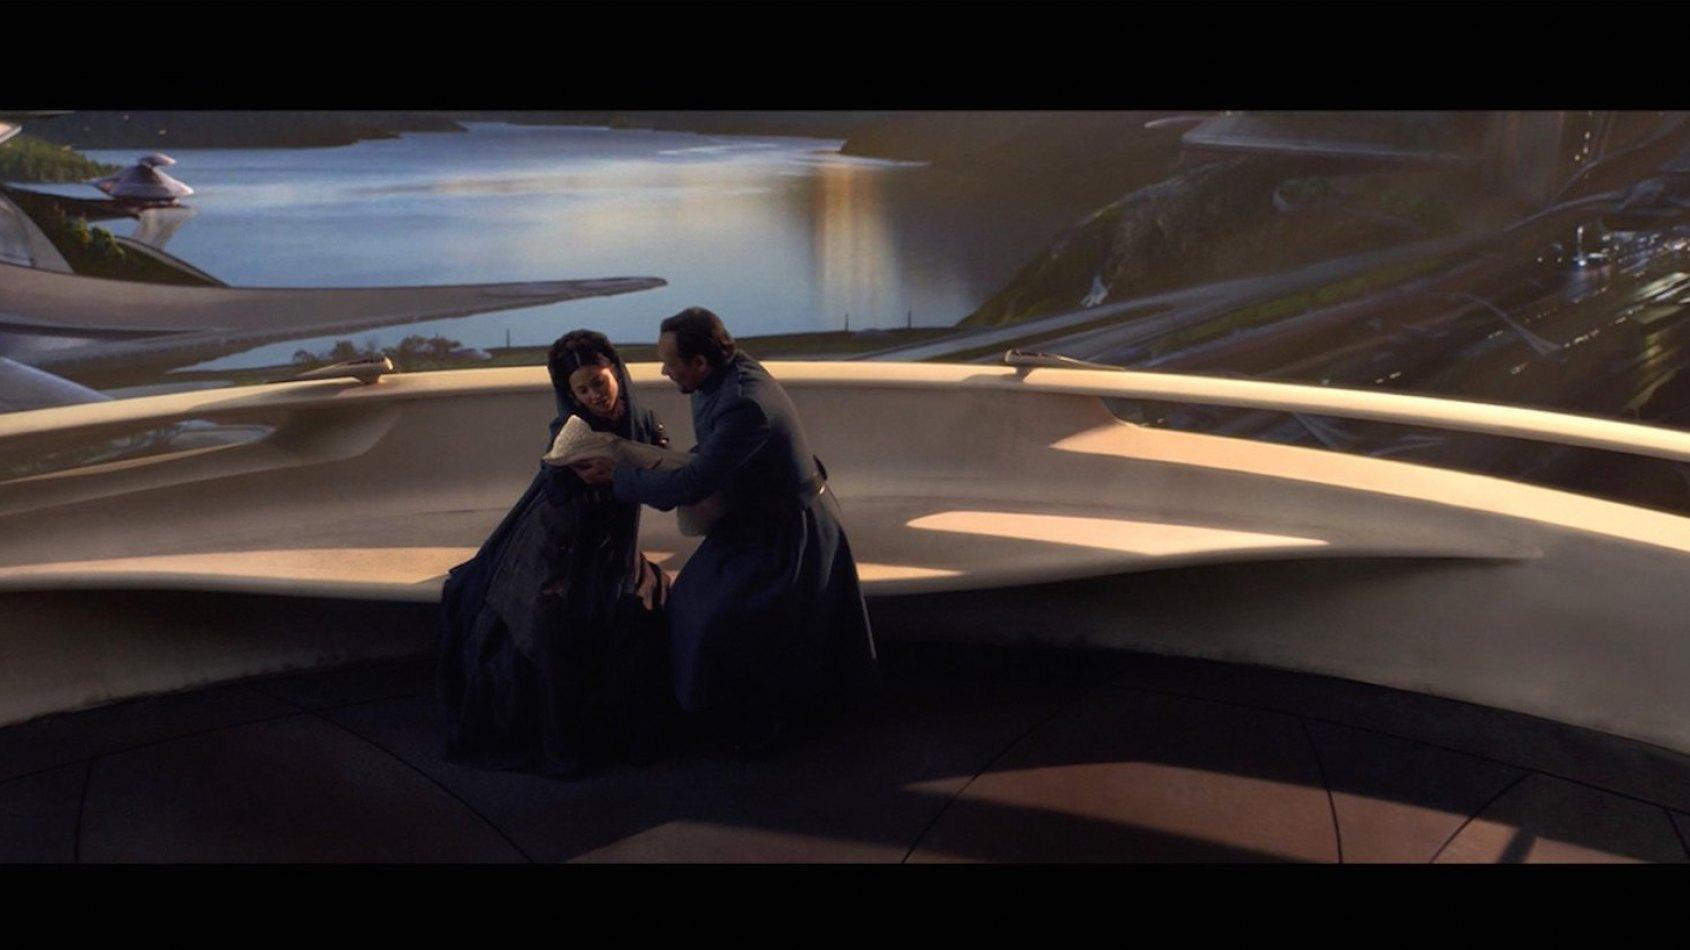 Bail Organa dans Rogue One: A Star Wars Story?